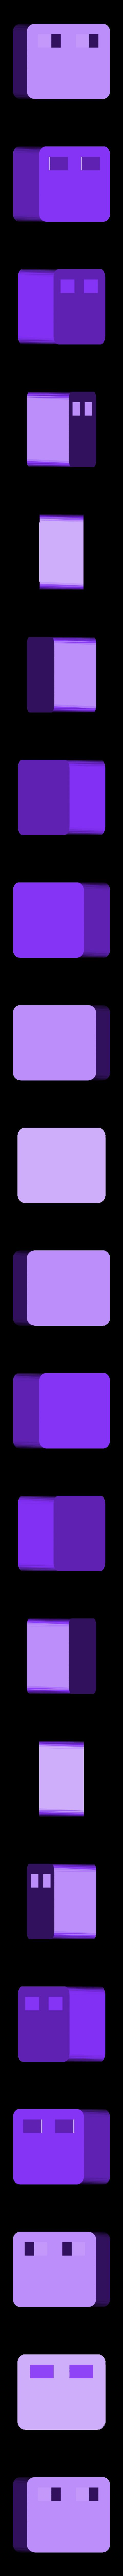 8-front_dumper_block.stl Download free STL file OpenRC Tractor • 3D printable object, makitpro